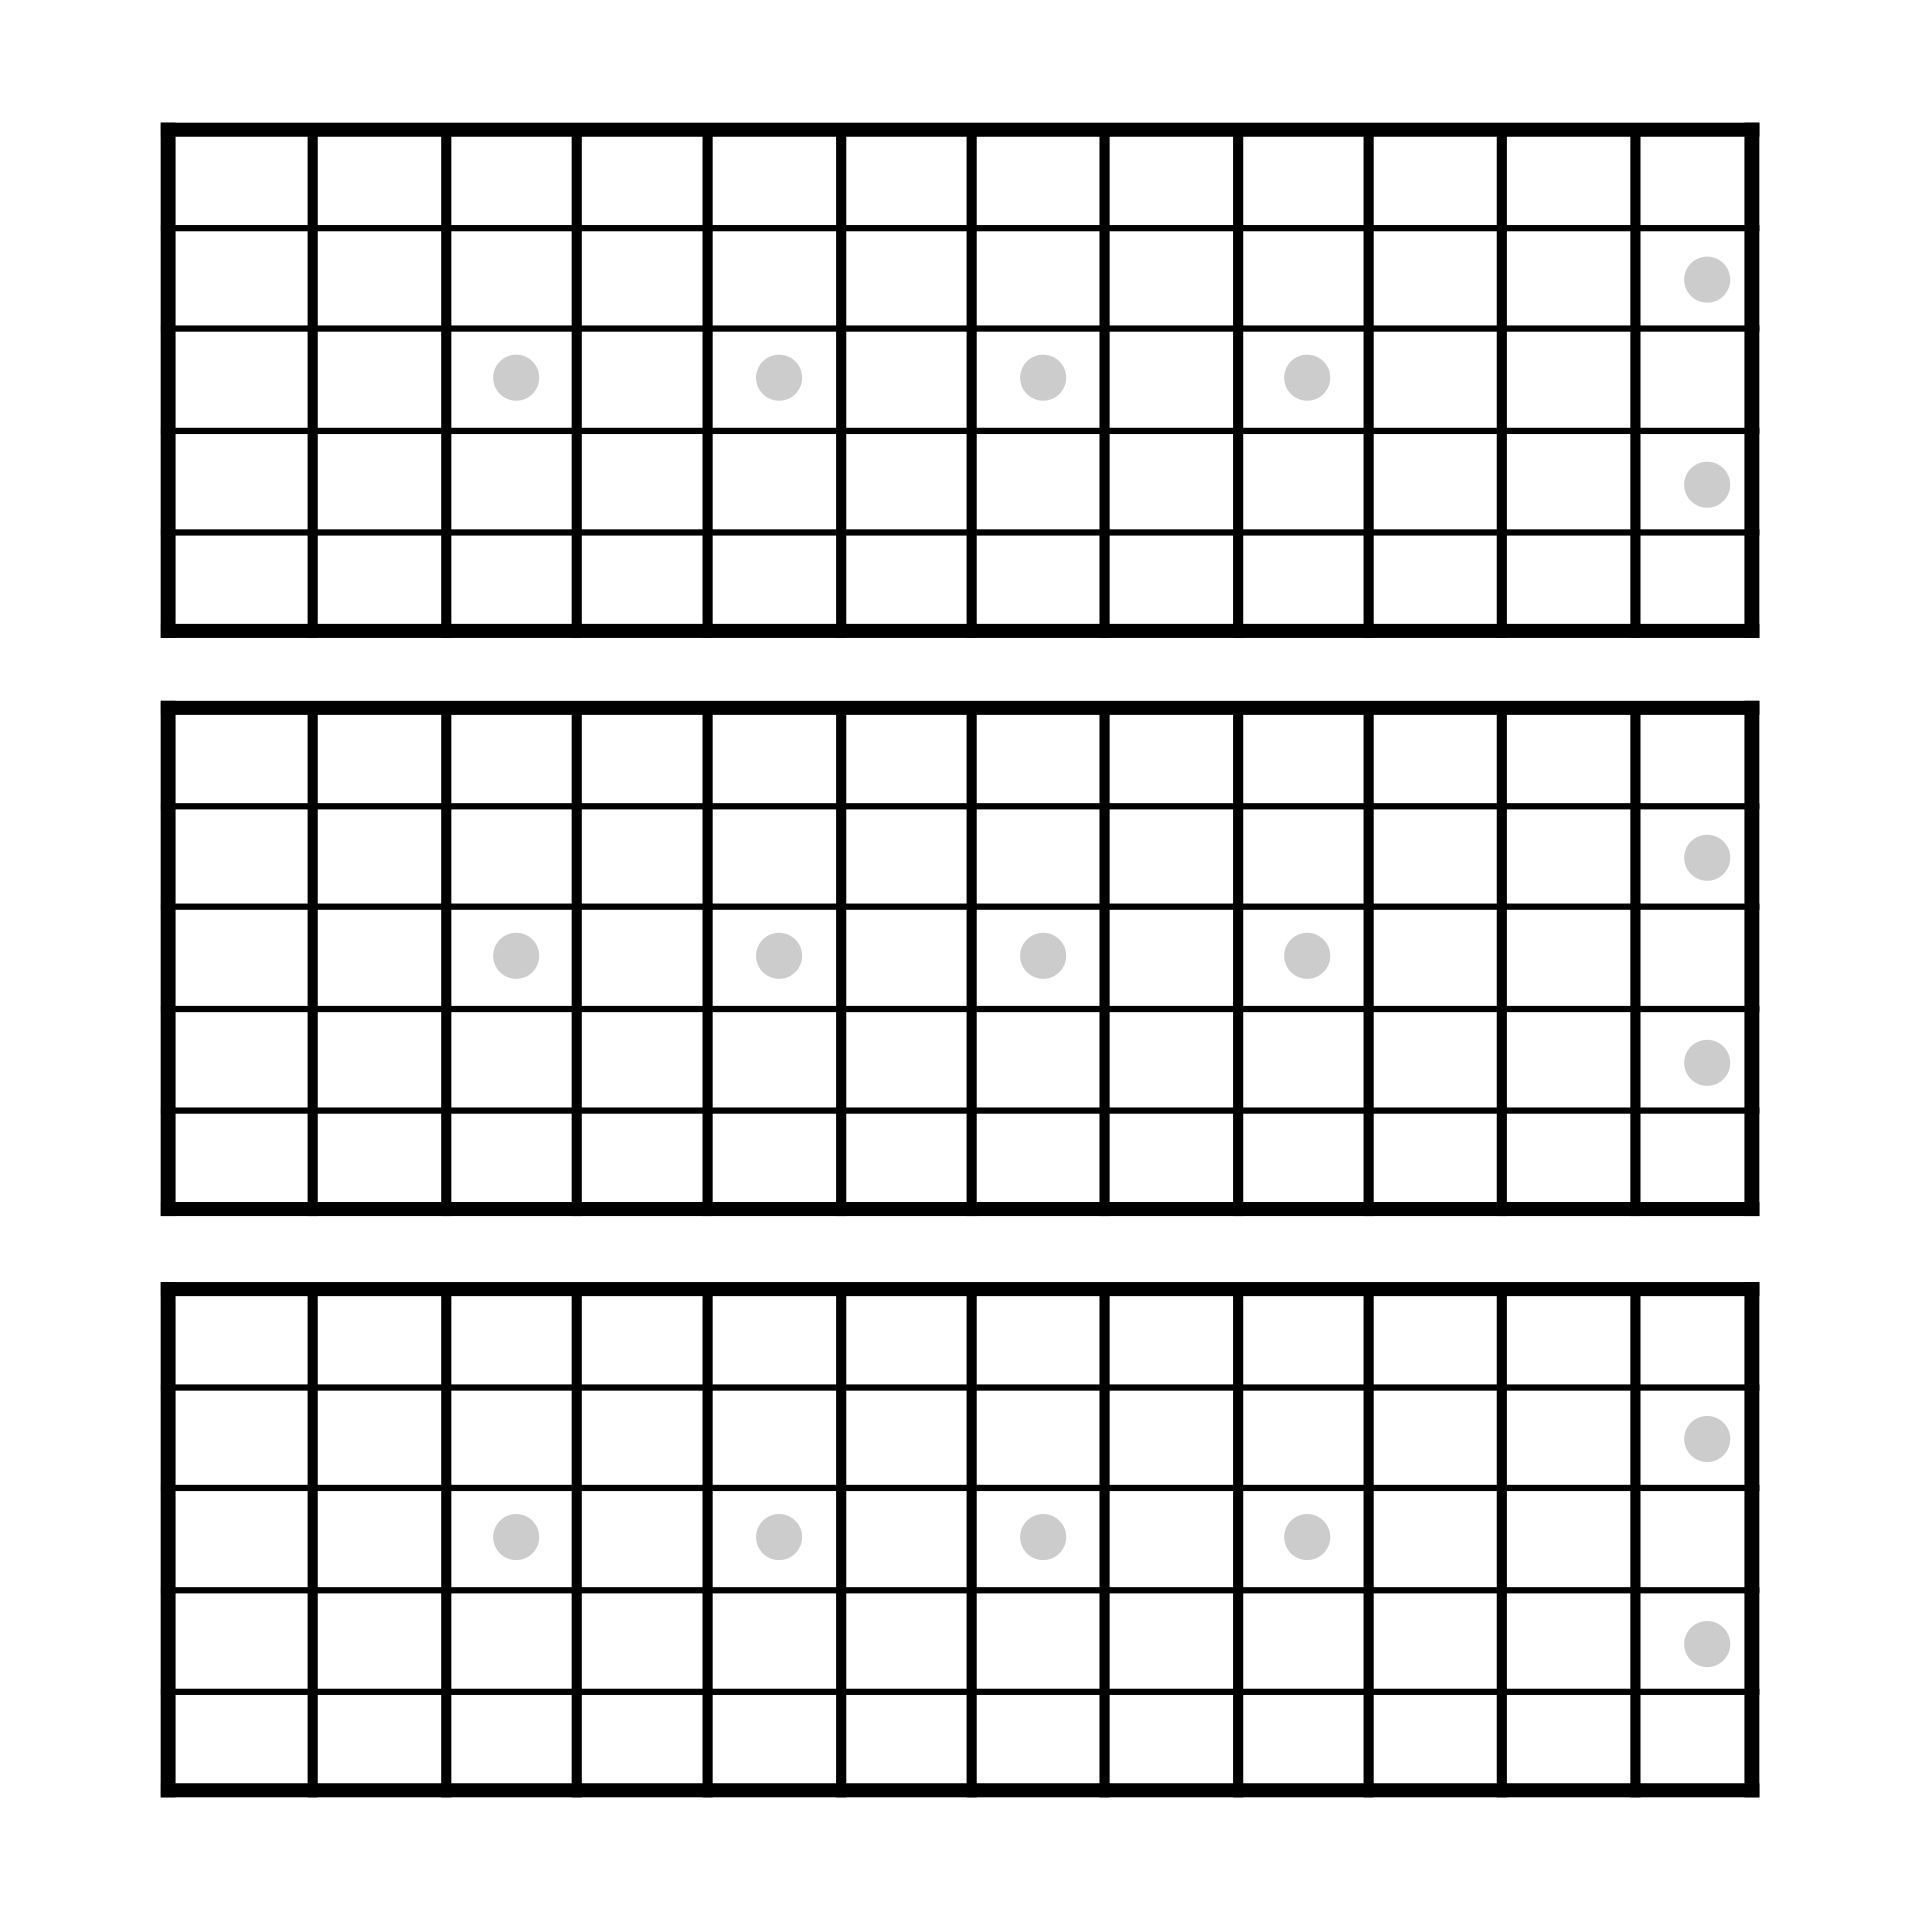 blank mandolin fretboard diagram honeywell aquastat l4006 wiring 8 best images of printable guitar boxes